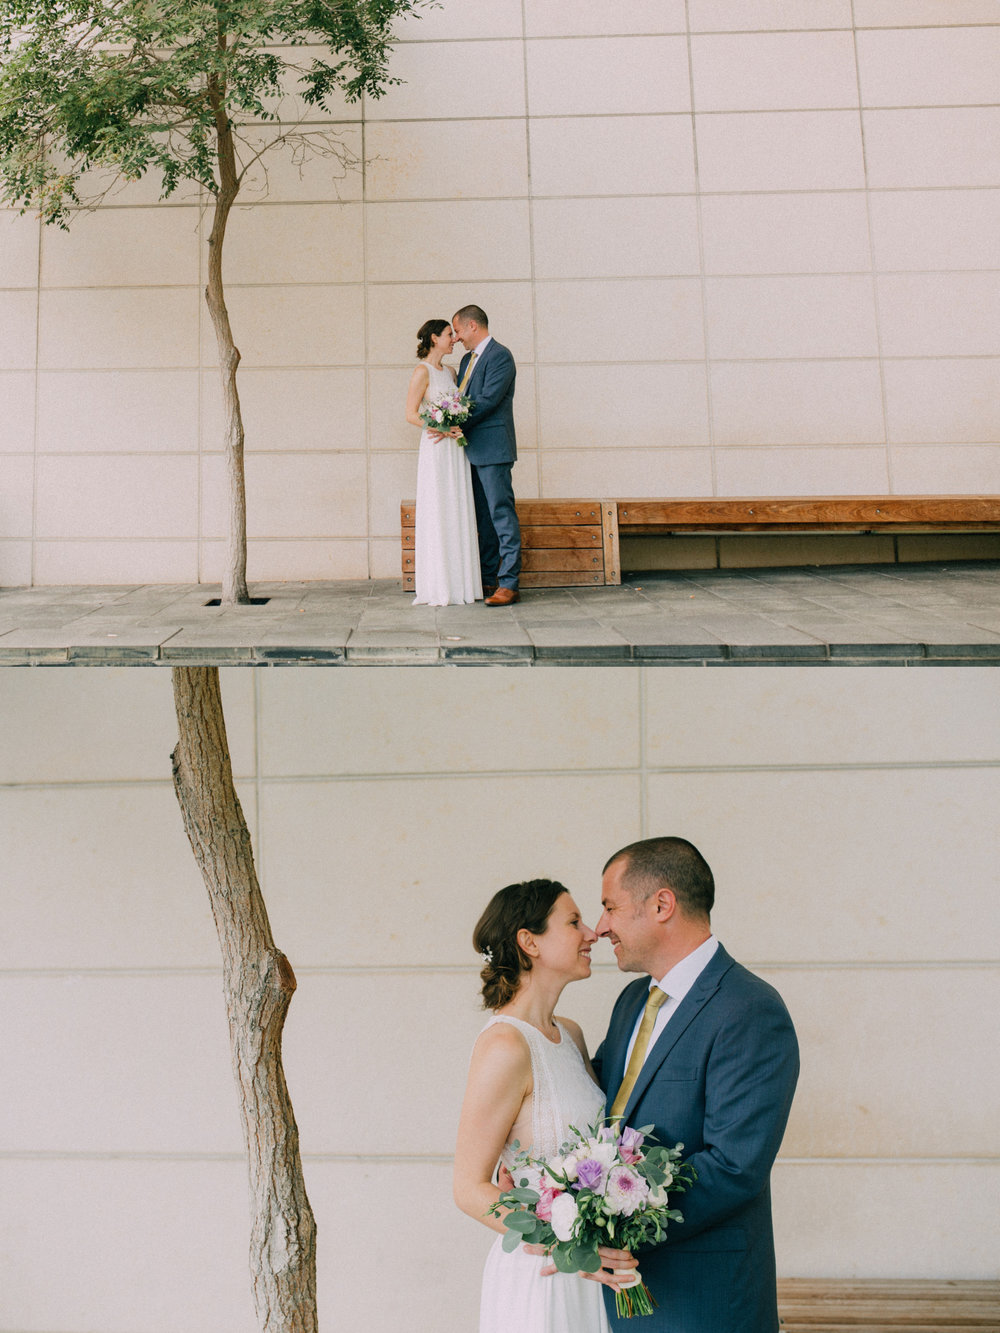 seattle courthouse wedding photographer elopement washington state-11.jpg